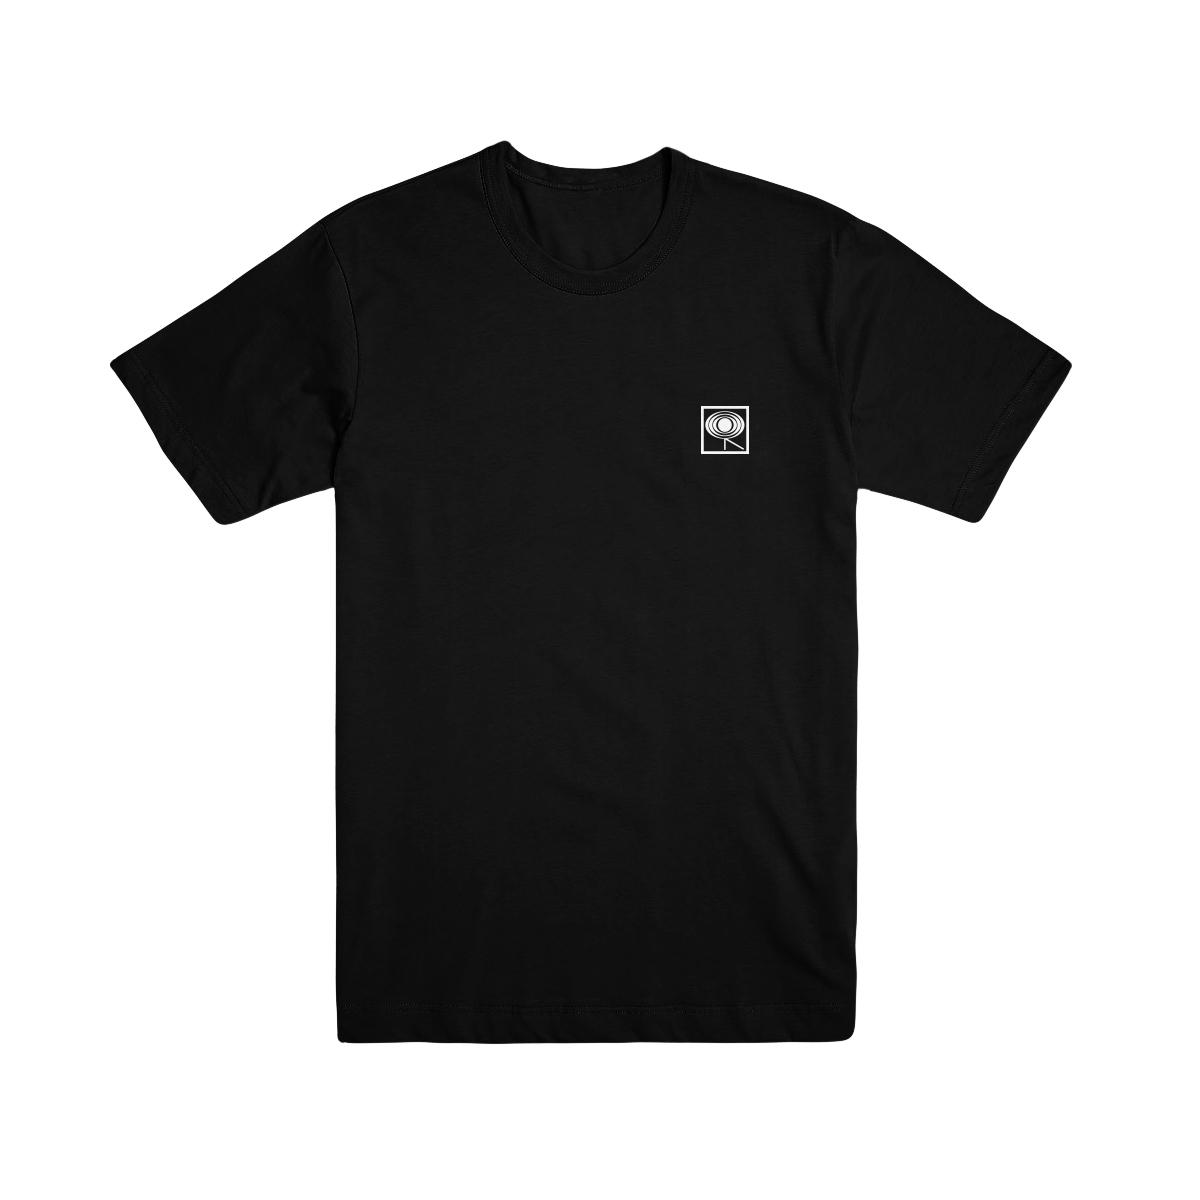 Columbia Records Black T-Shirt